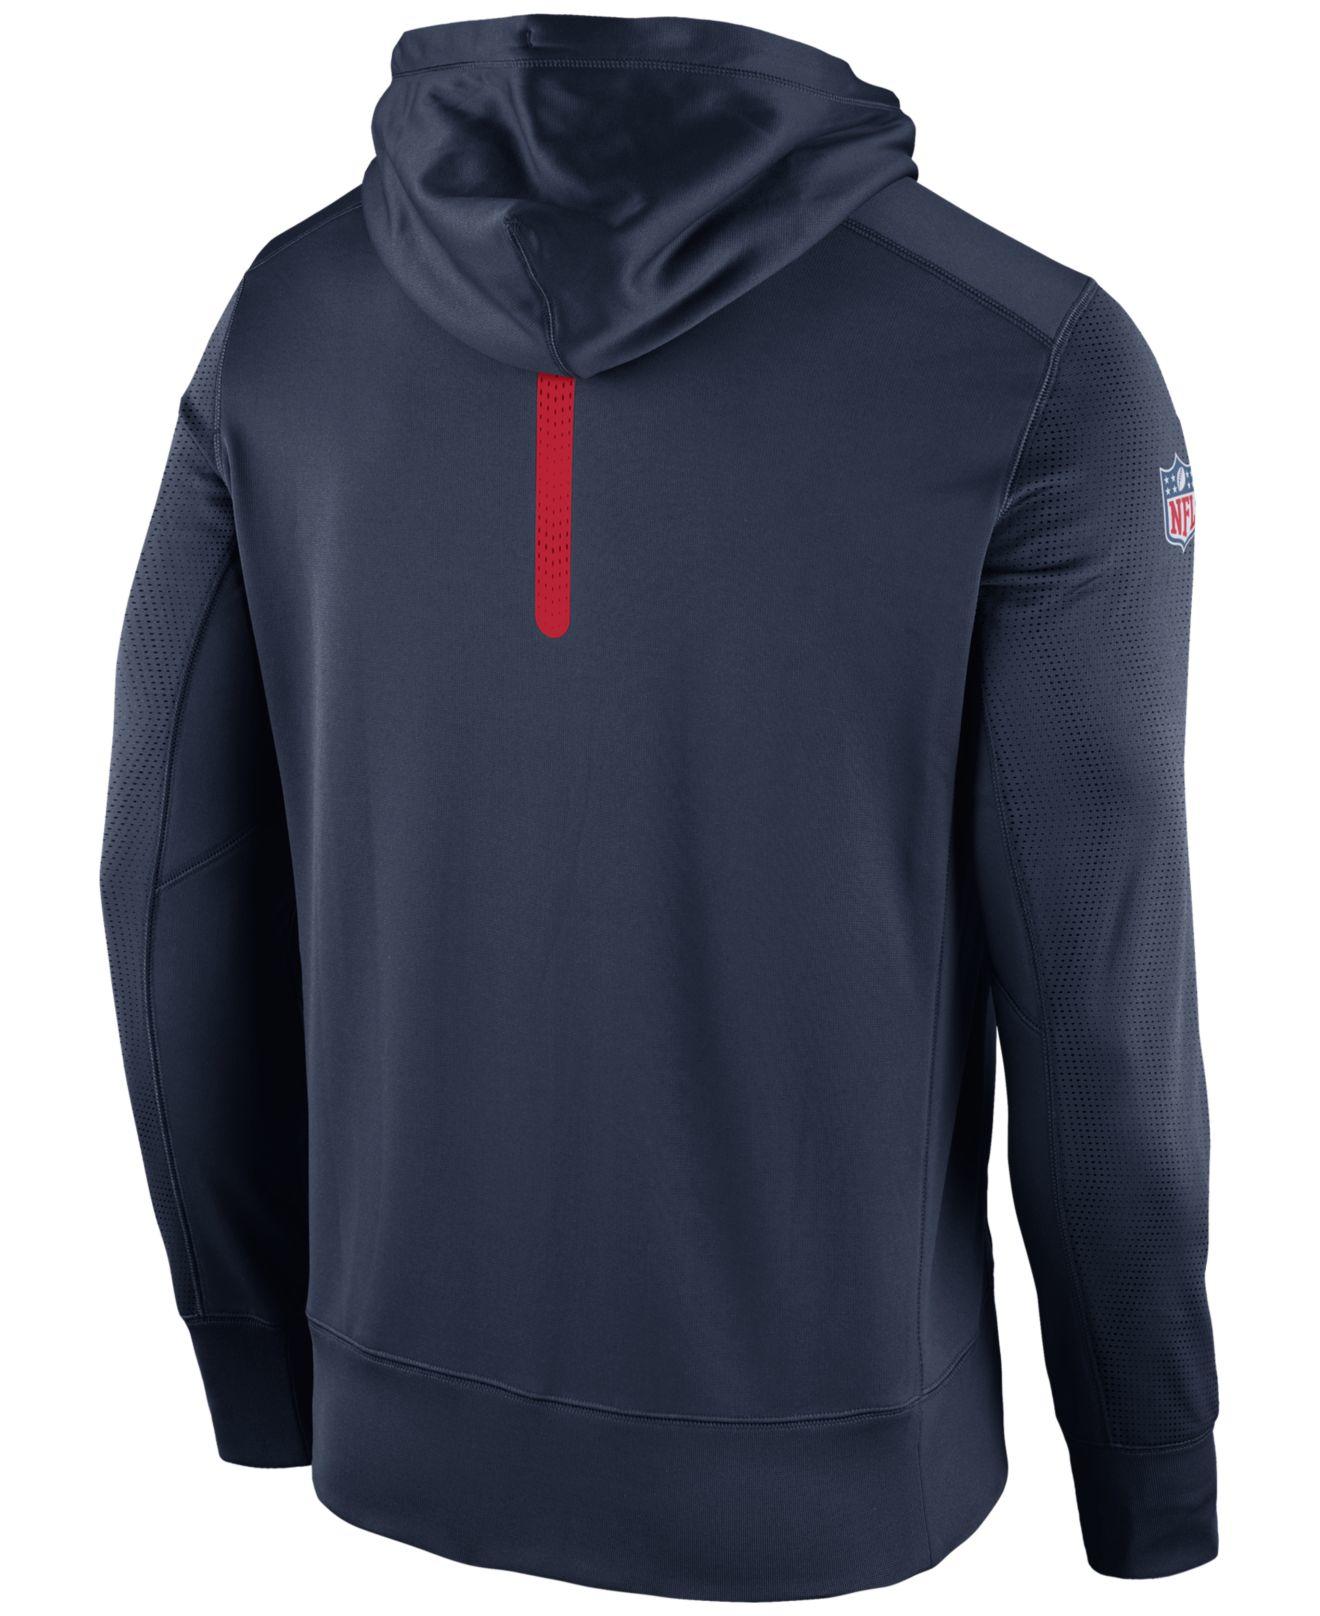 Lyst - Nike Men s New England Patriots Sideline Ko Fleece Full-zip ... 43f819a75